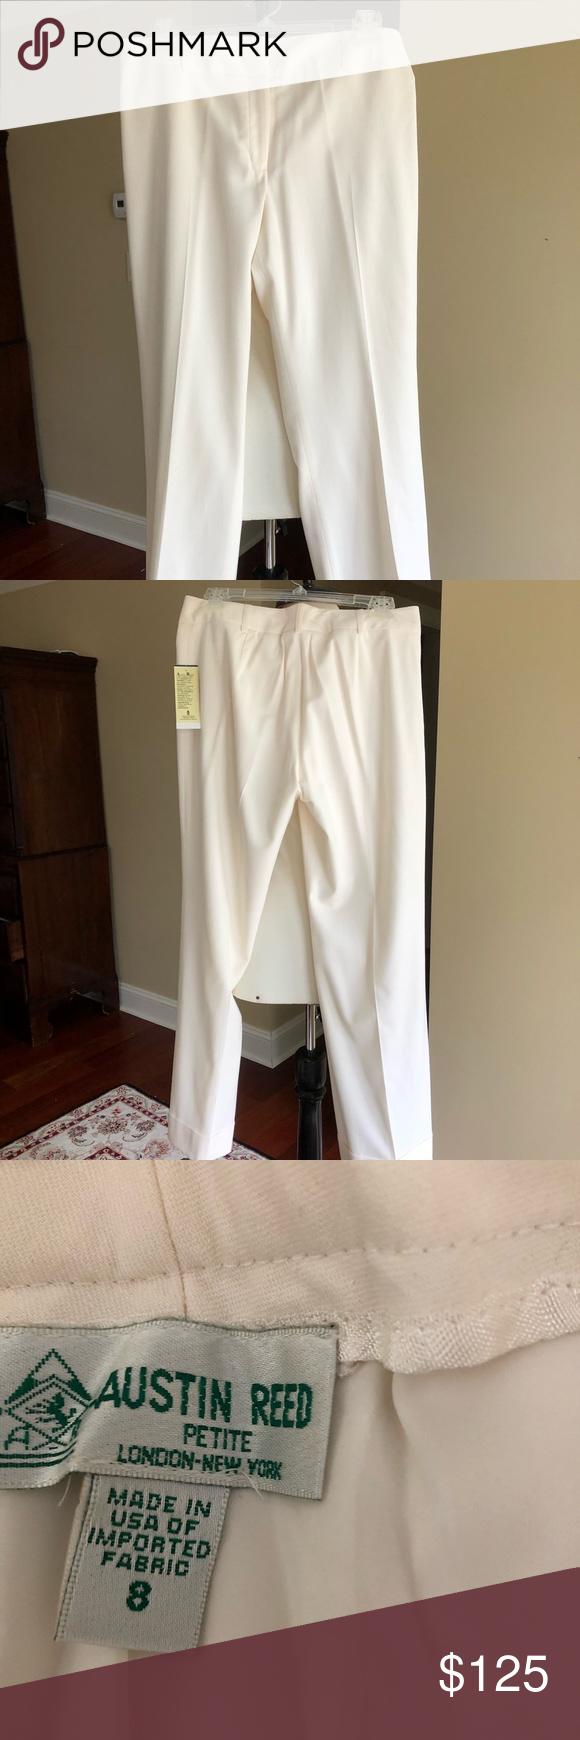 Antique White Austin Reed Trousers Clothes Design Austin Reed Fashion Design